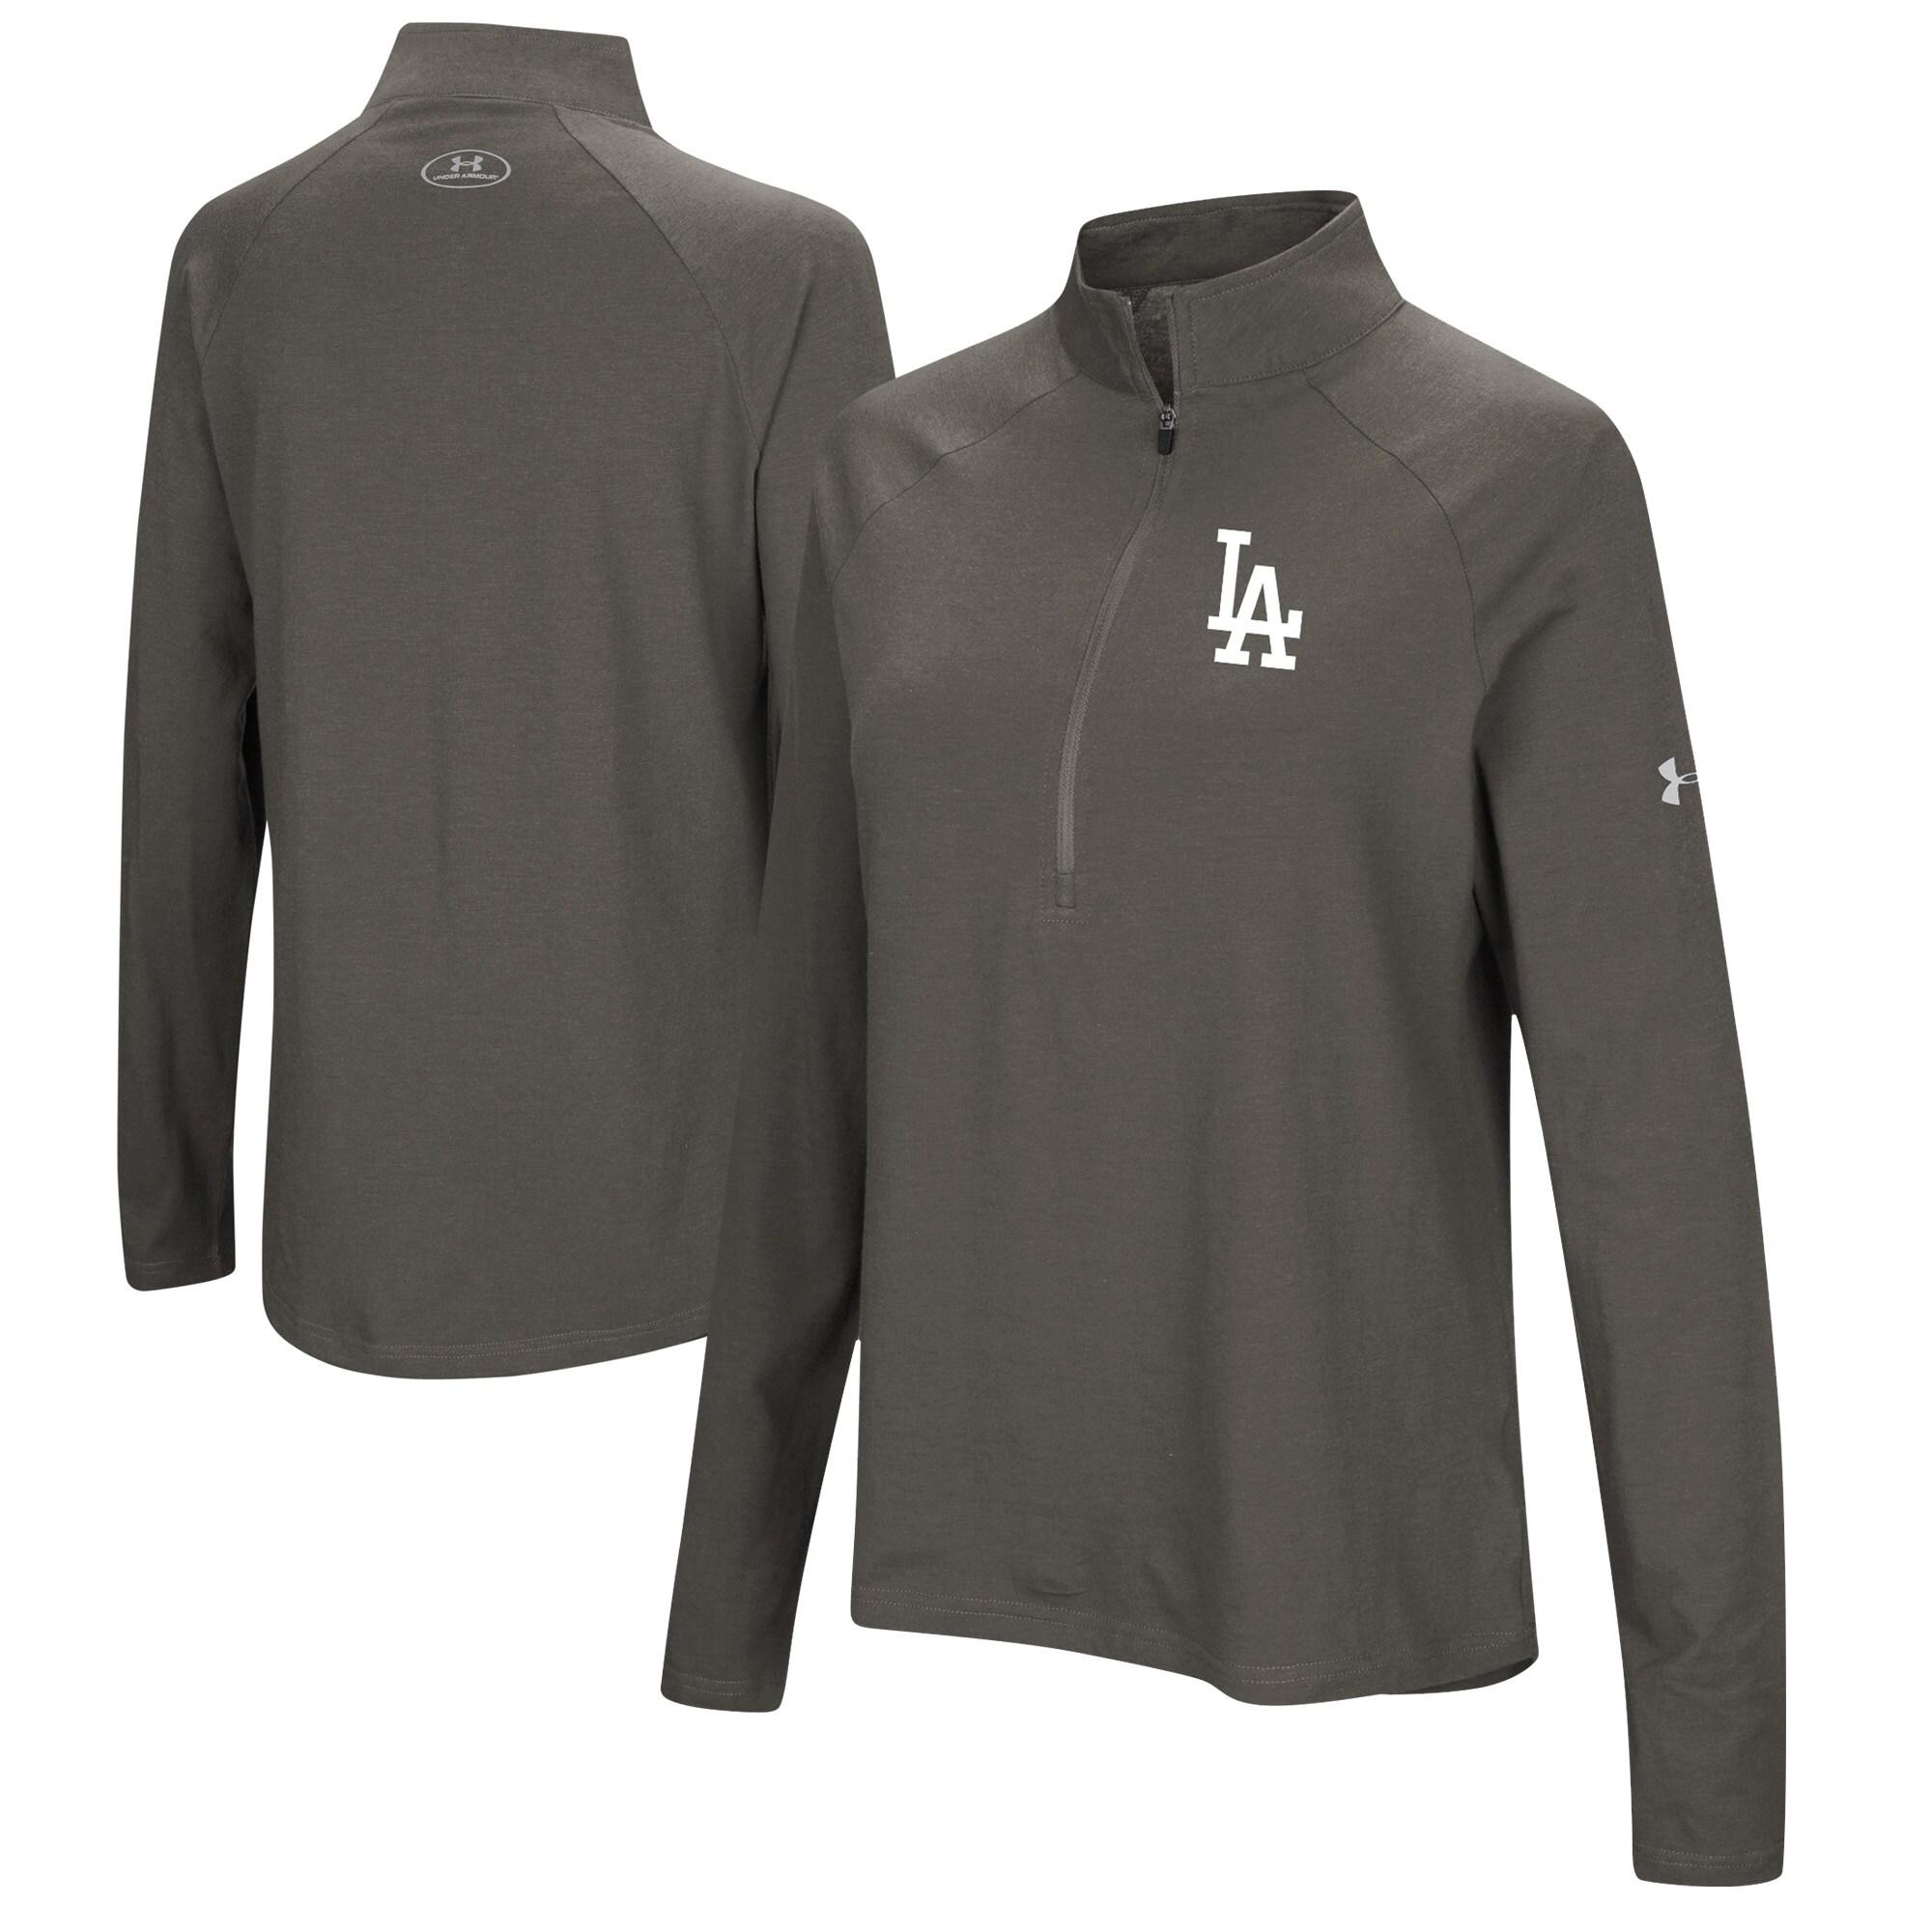 Los Angeles Dodgers Under Armour Women's Passion Performance Tri-Blend Raglan Half-Zip Pullover Jacket - Heathered Gray